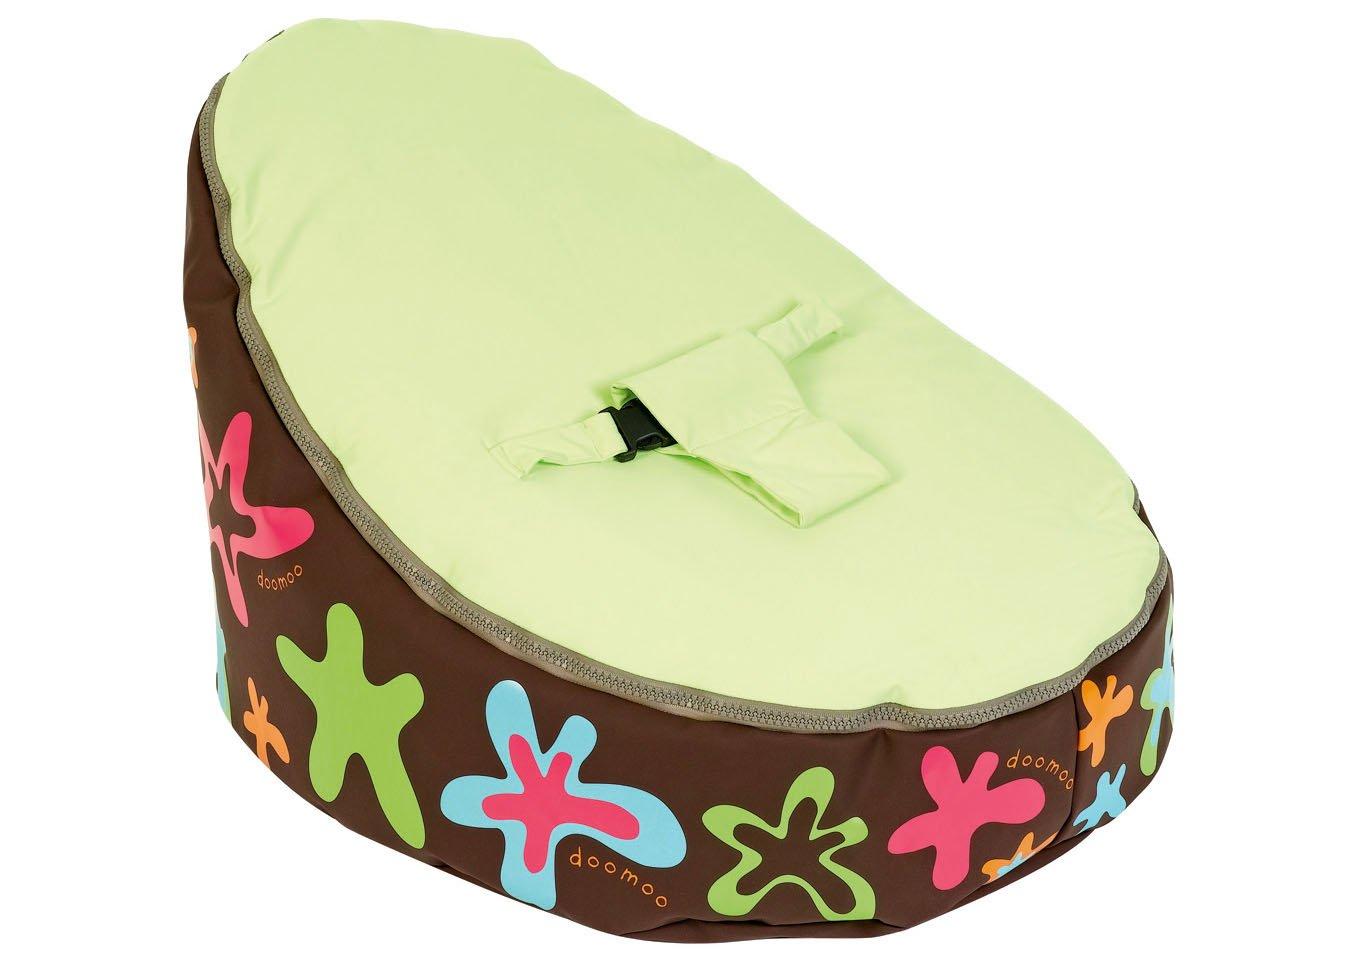 Babymoov - Sillón para niños pequeños, 40 x 60 x 30 cm, color lima (A012301) nbb-677